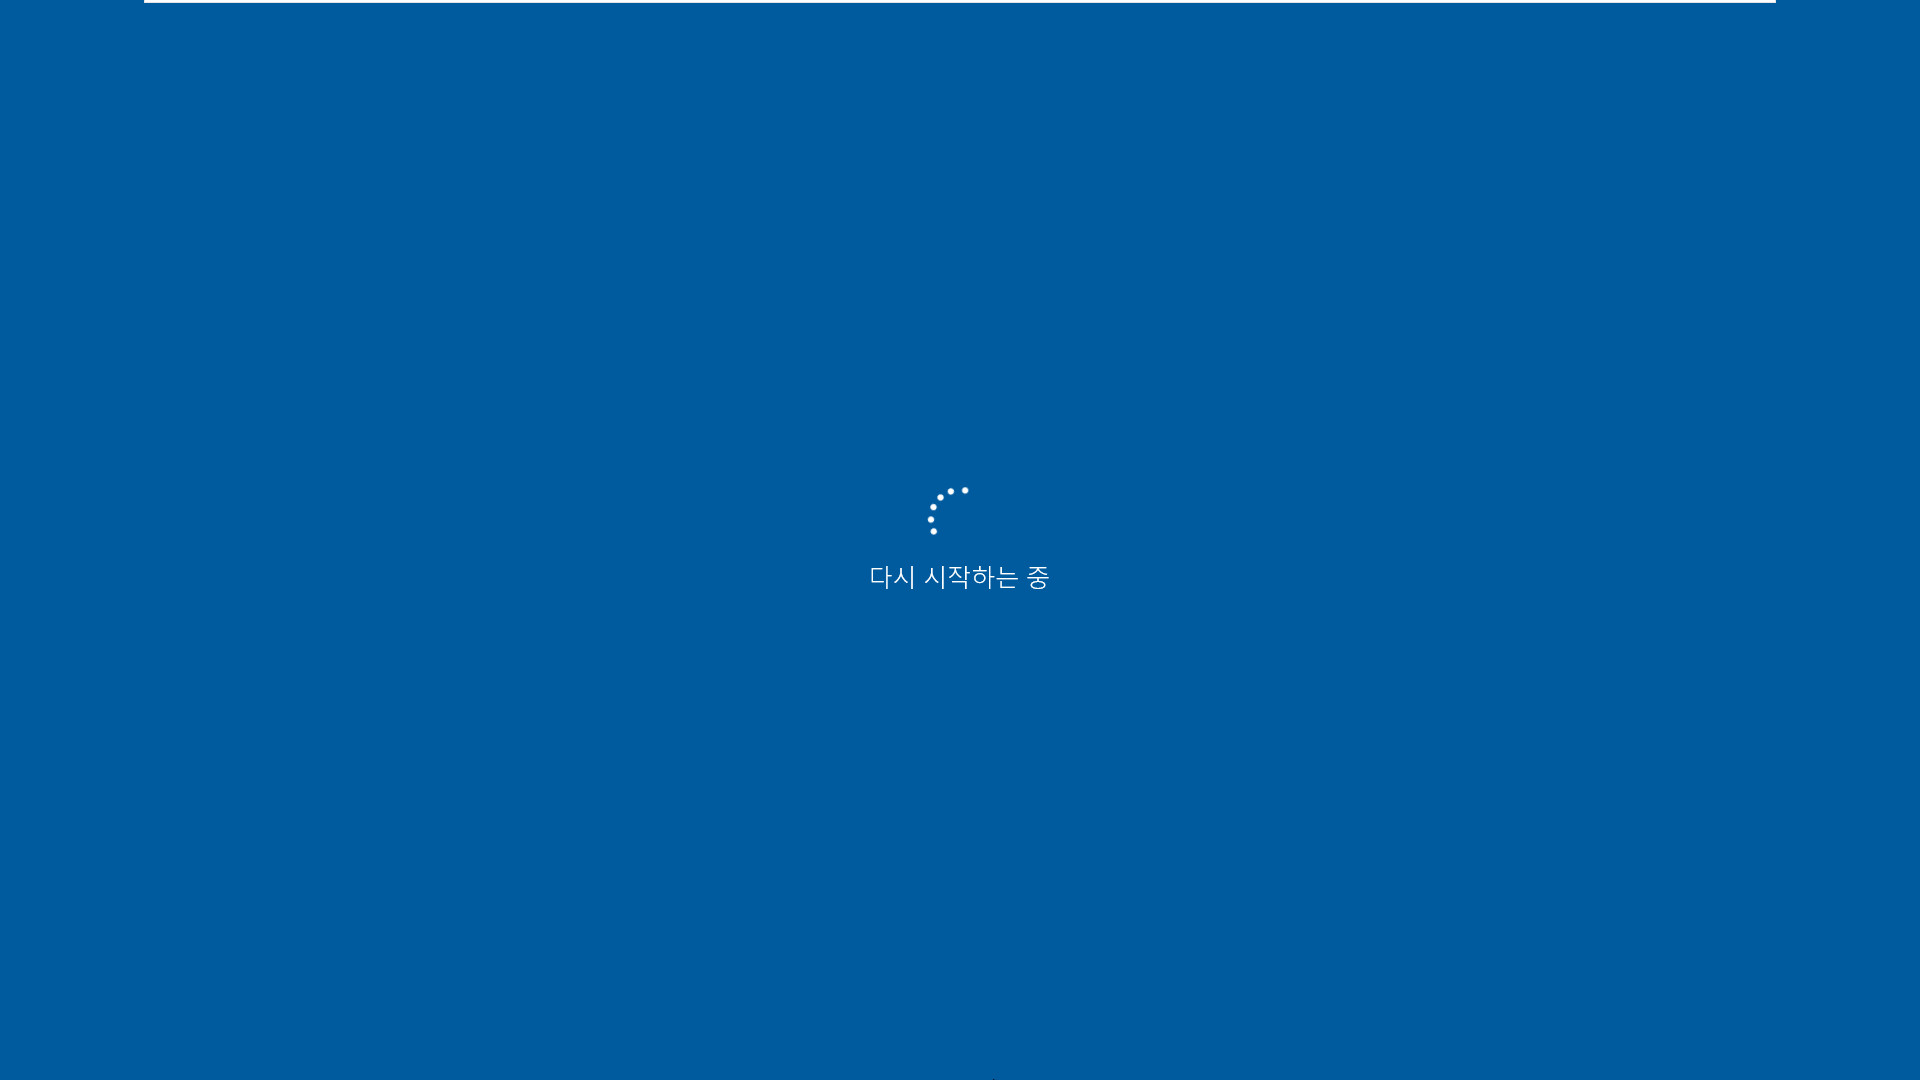 Windows 10 버전 2004에서 버전 20H2의 투명한 시작 메뉴 사용하기.bat 테스트 2020-11-15_135335.jpg